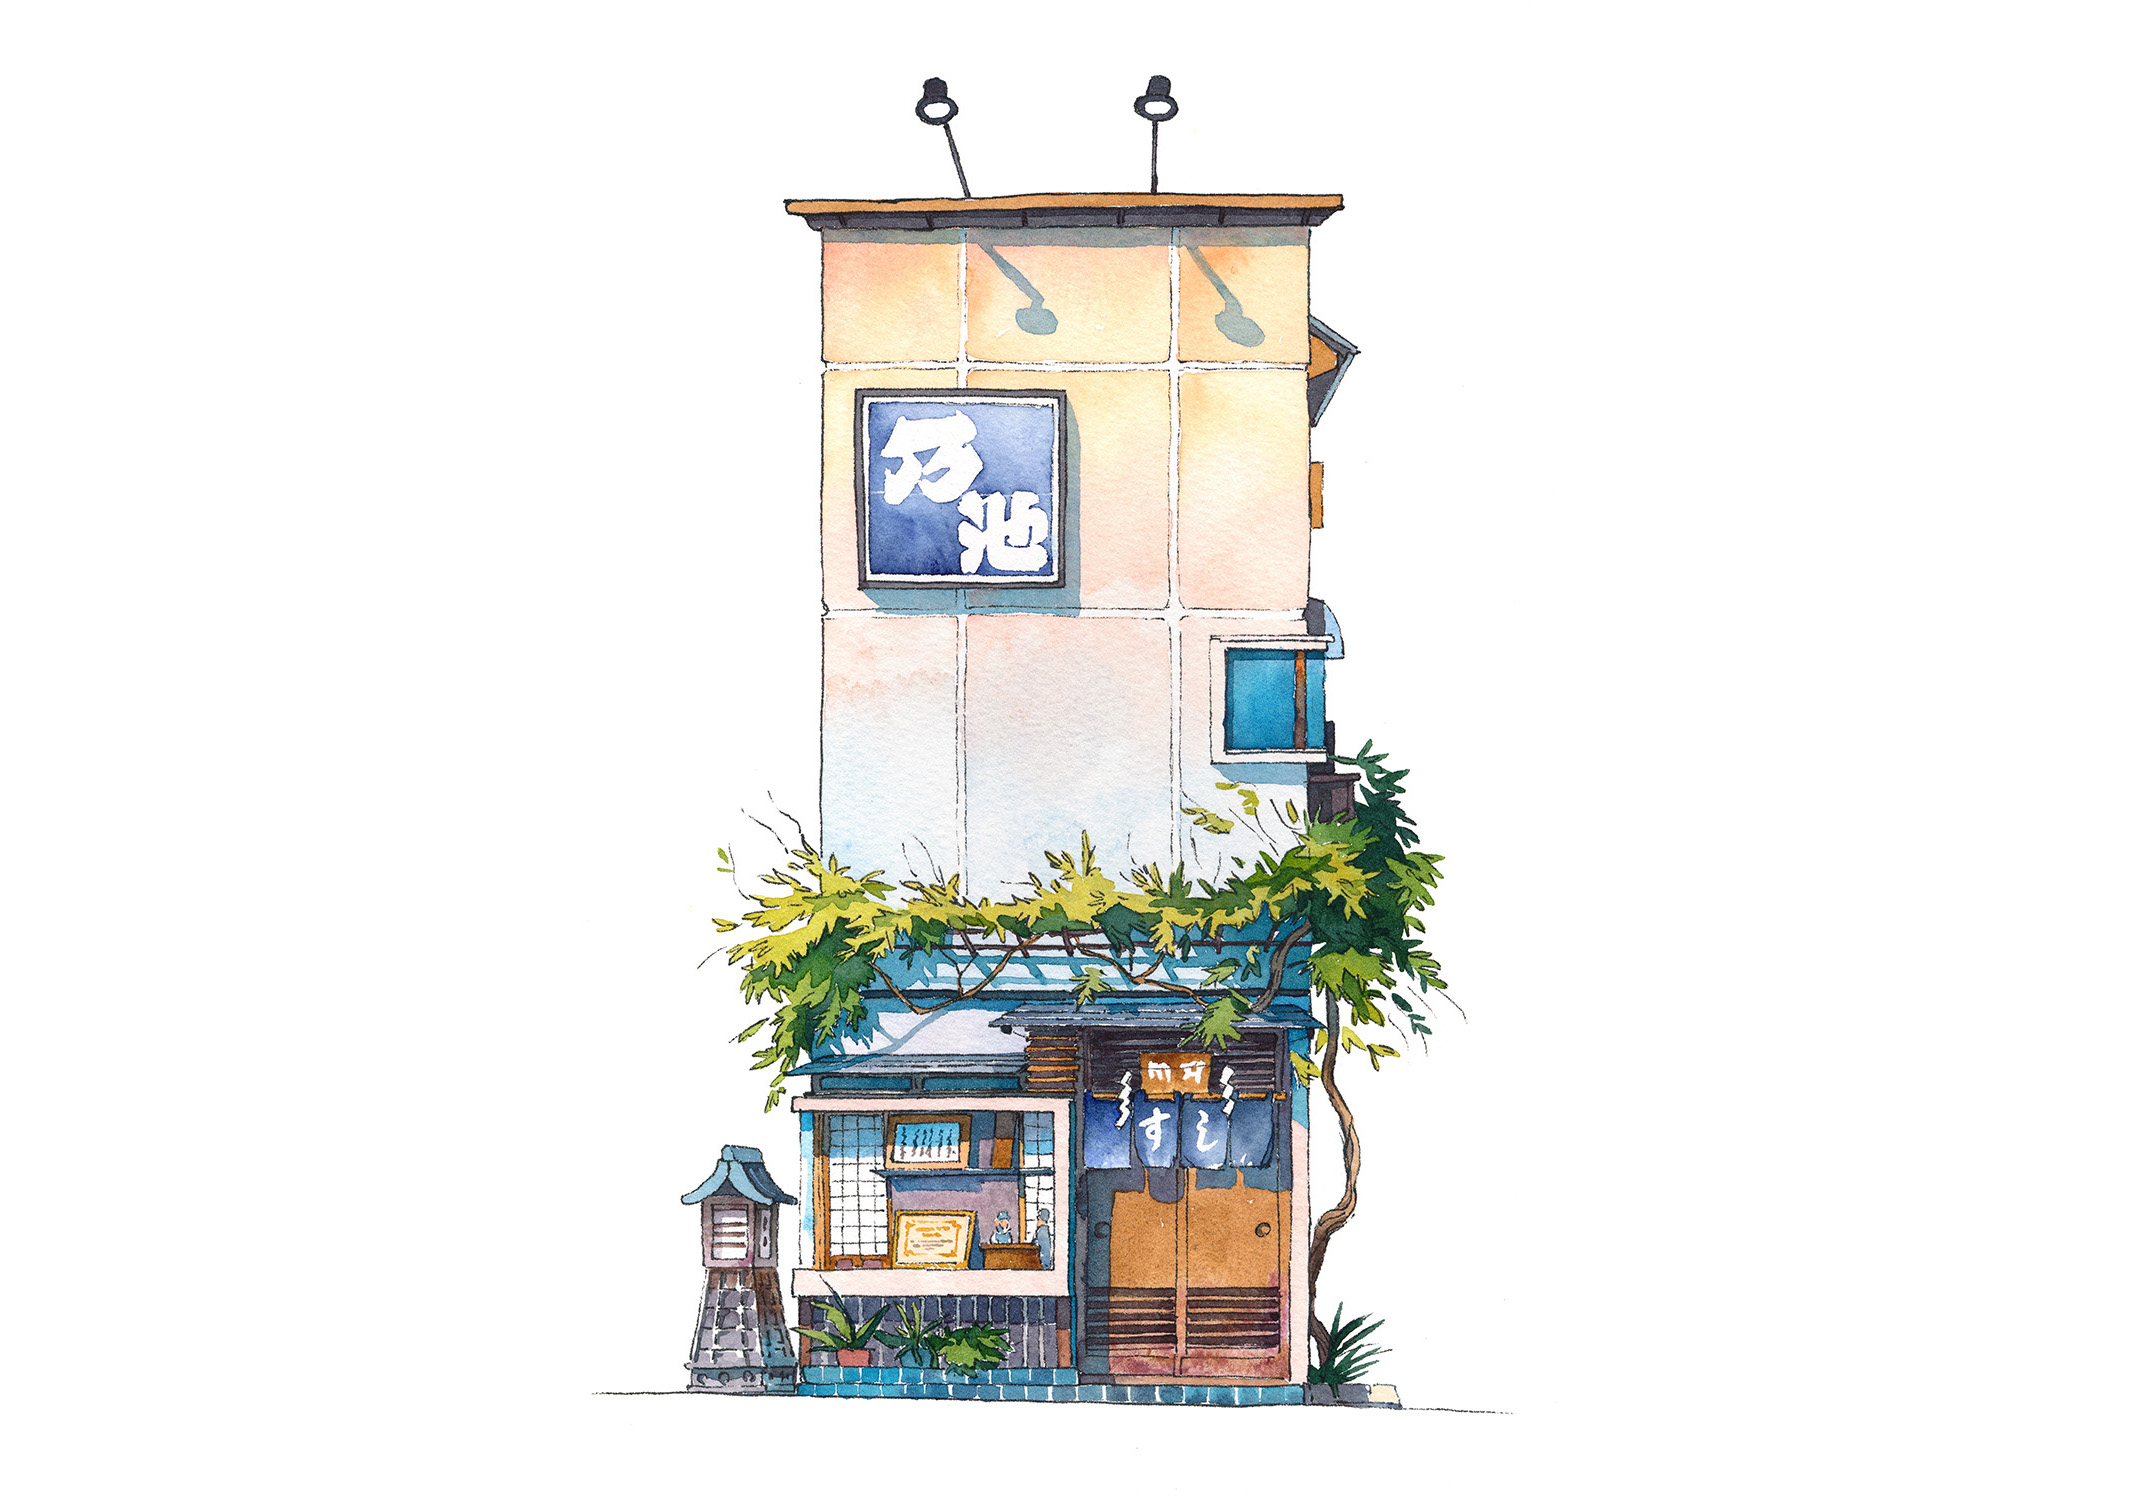 Noike sushi restaurant from Yanaka district